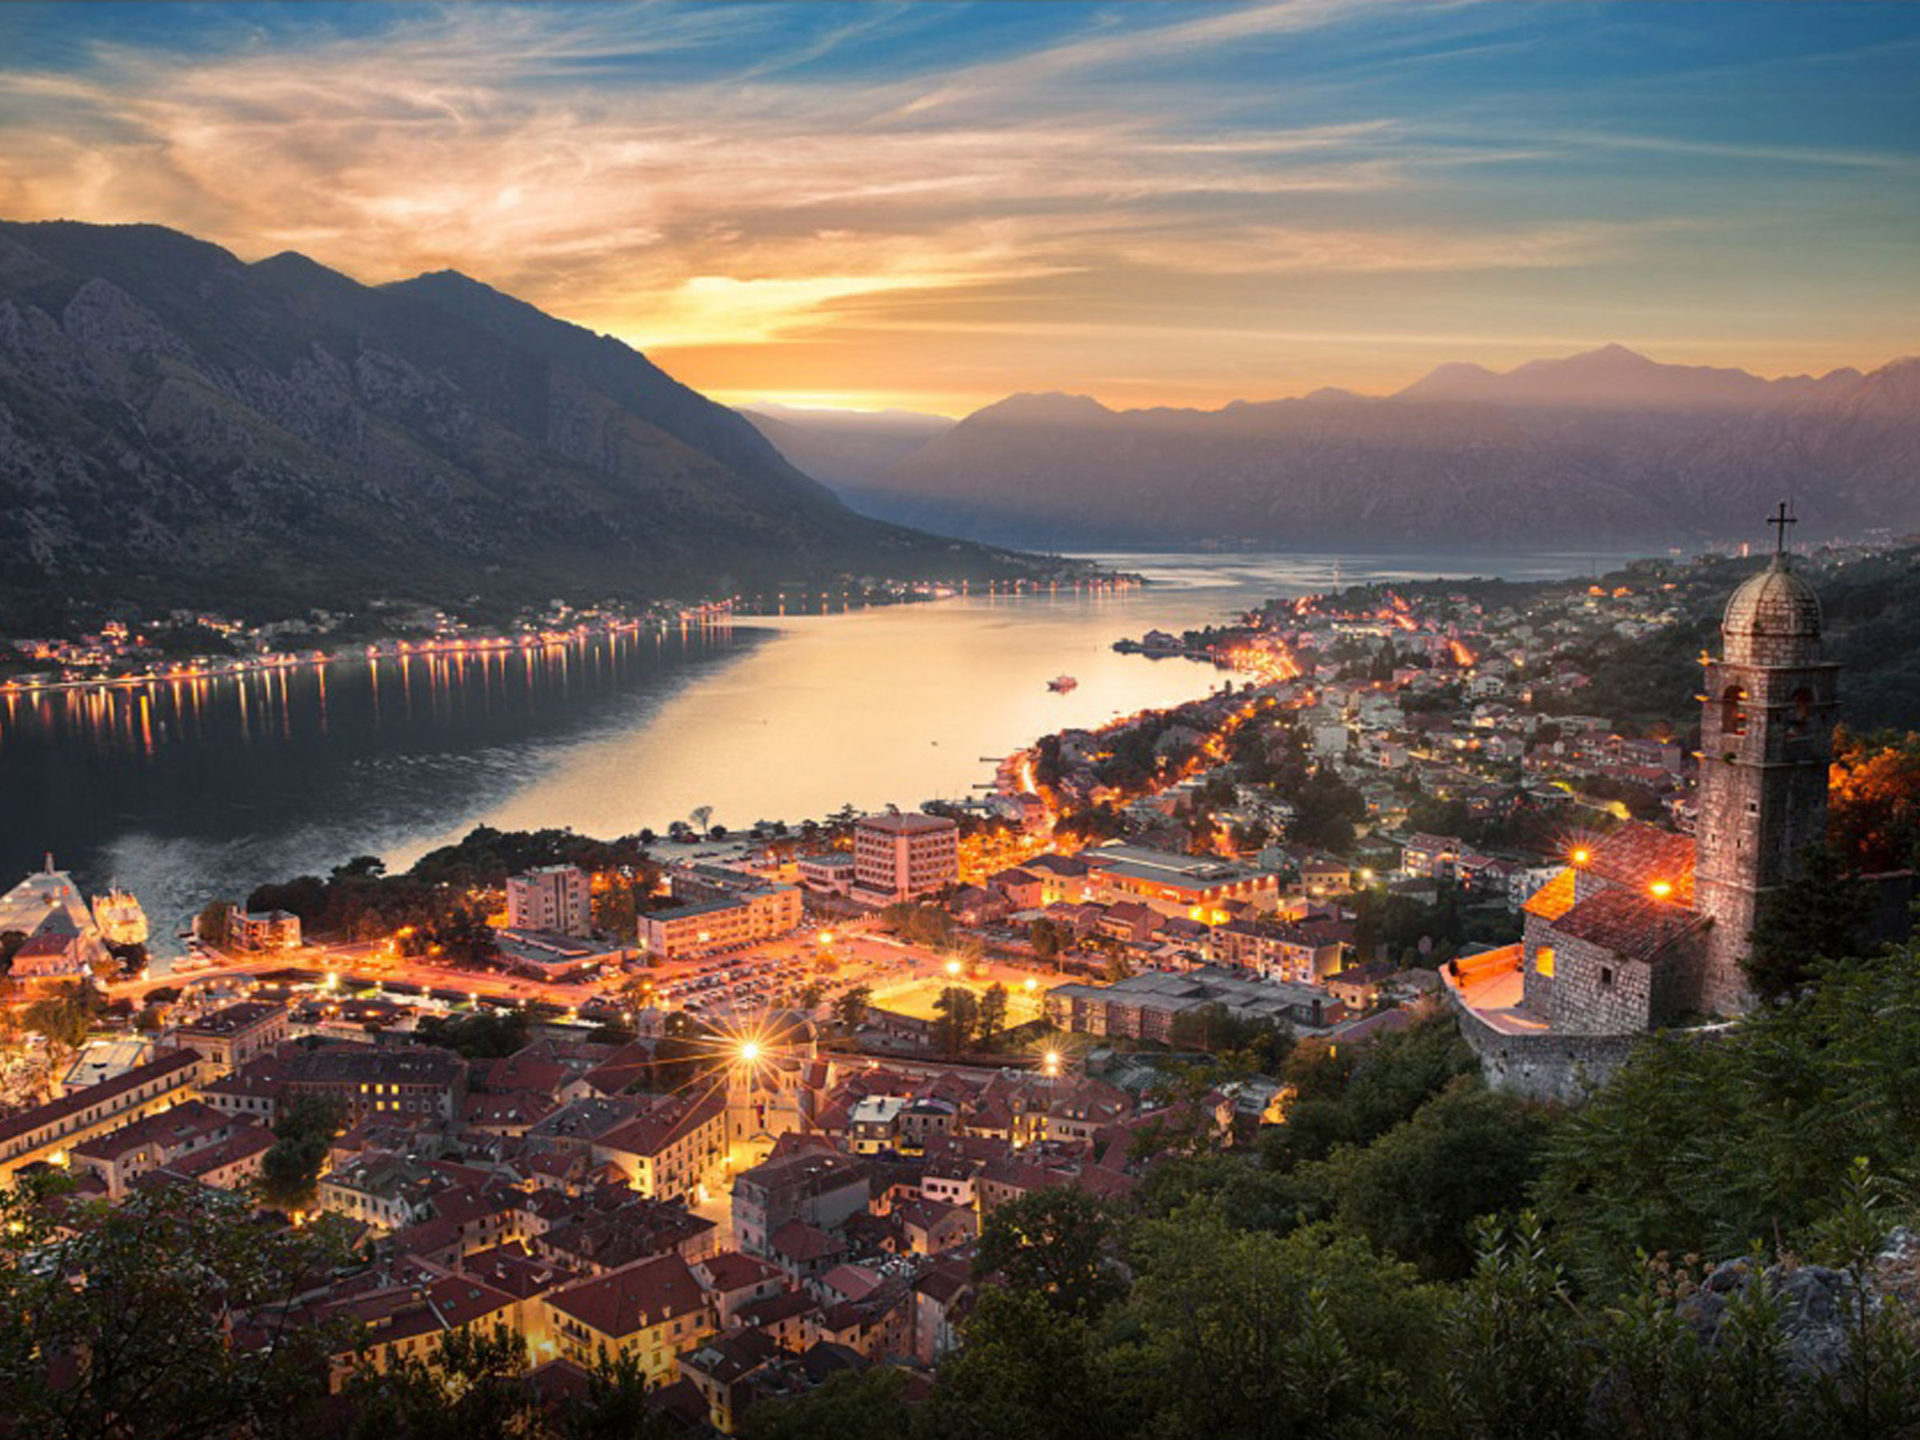 Wallpaper Batman Iphone X Montenegro City Kotor At Night Desktop Wallpaper Hd